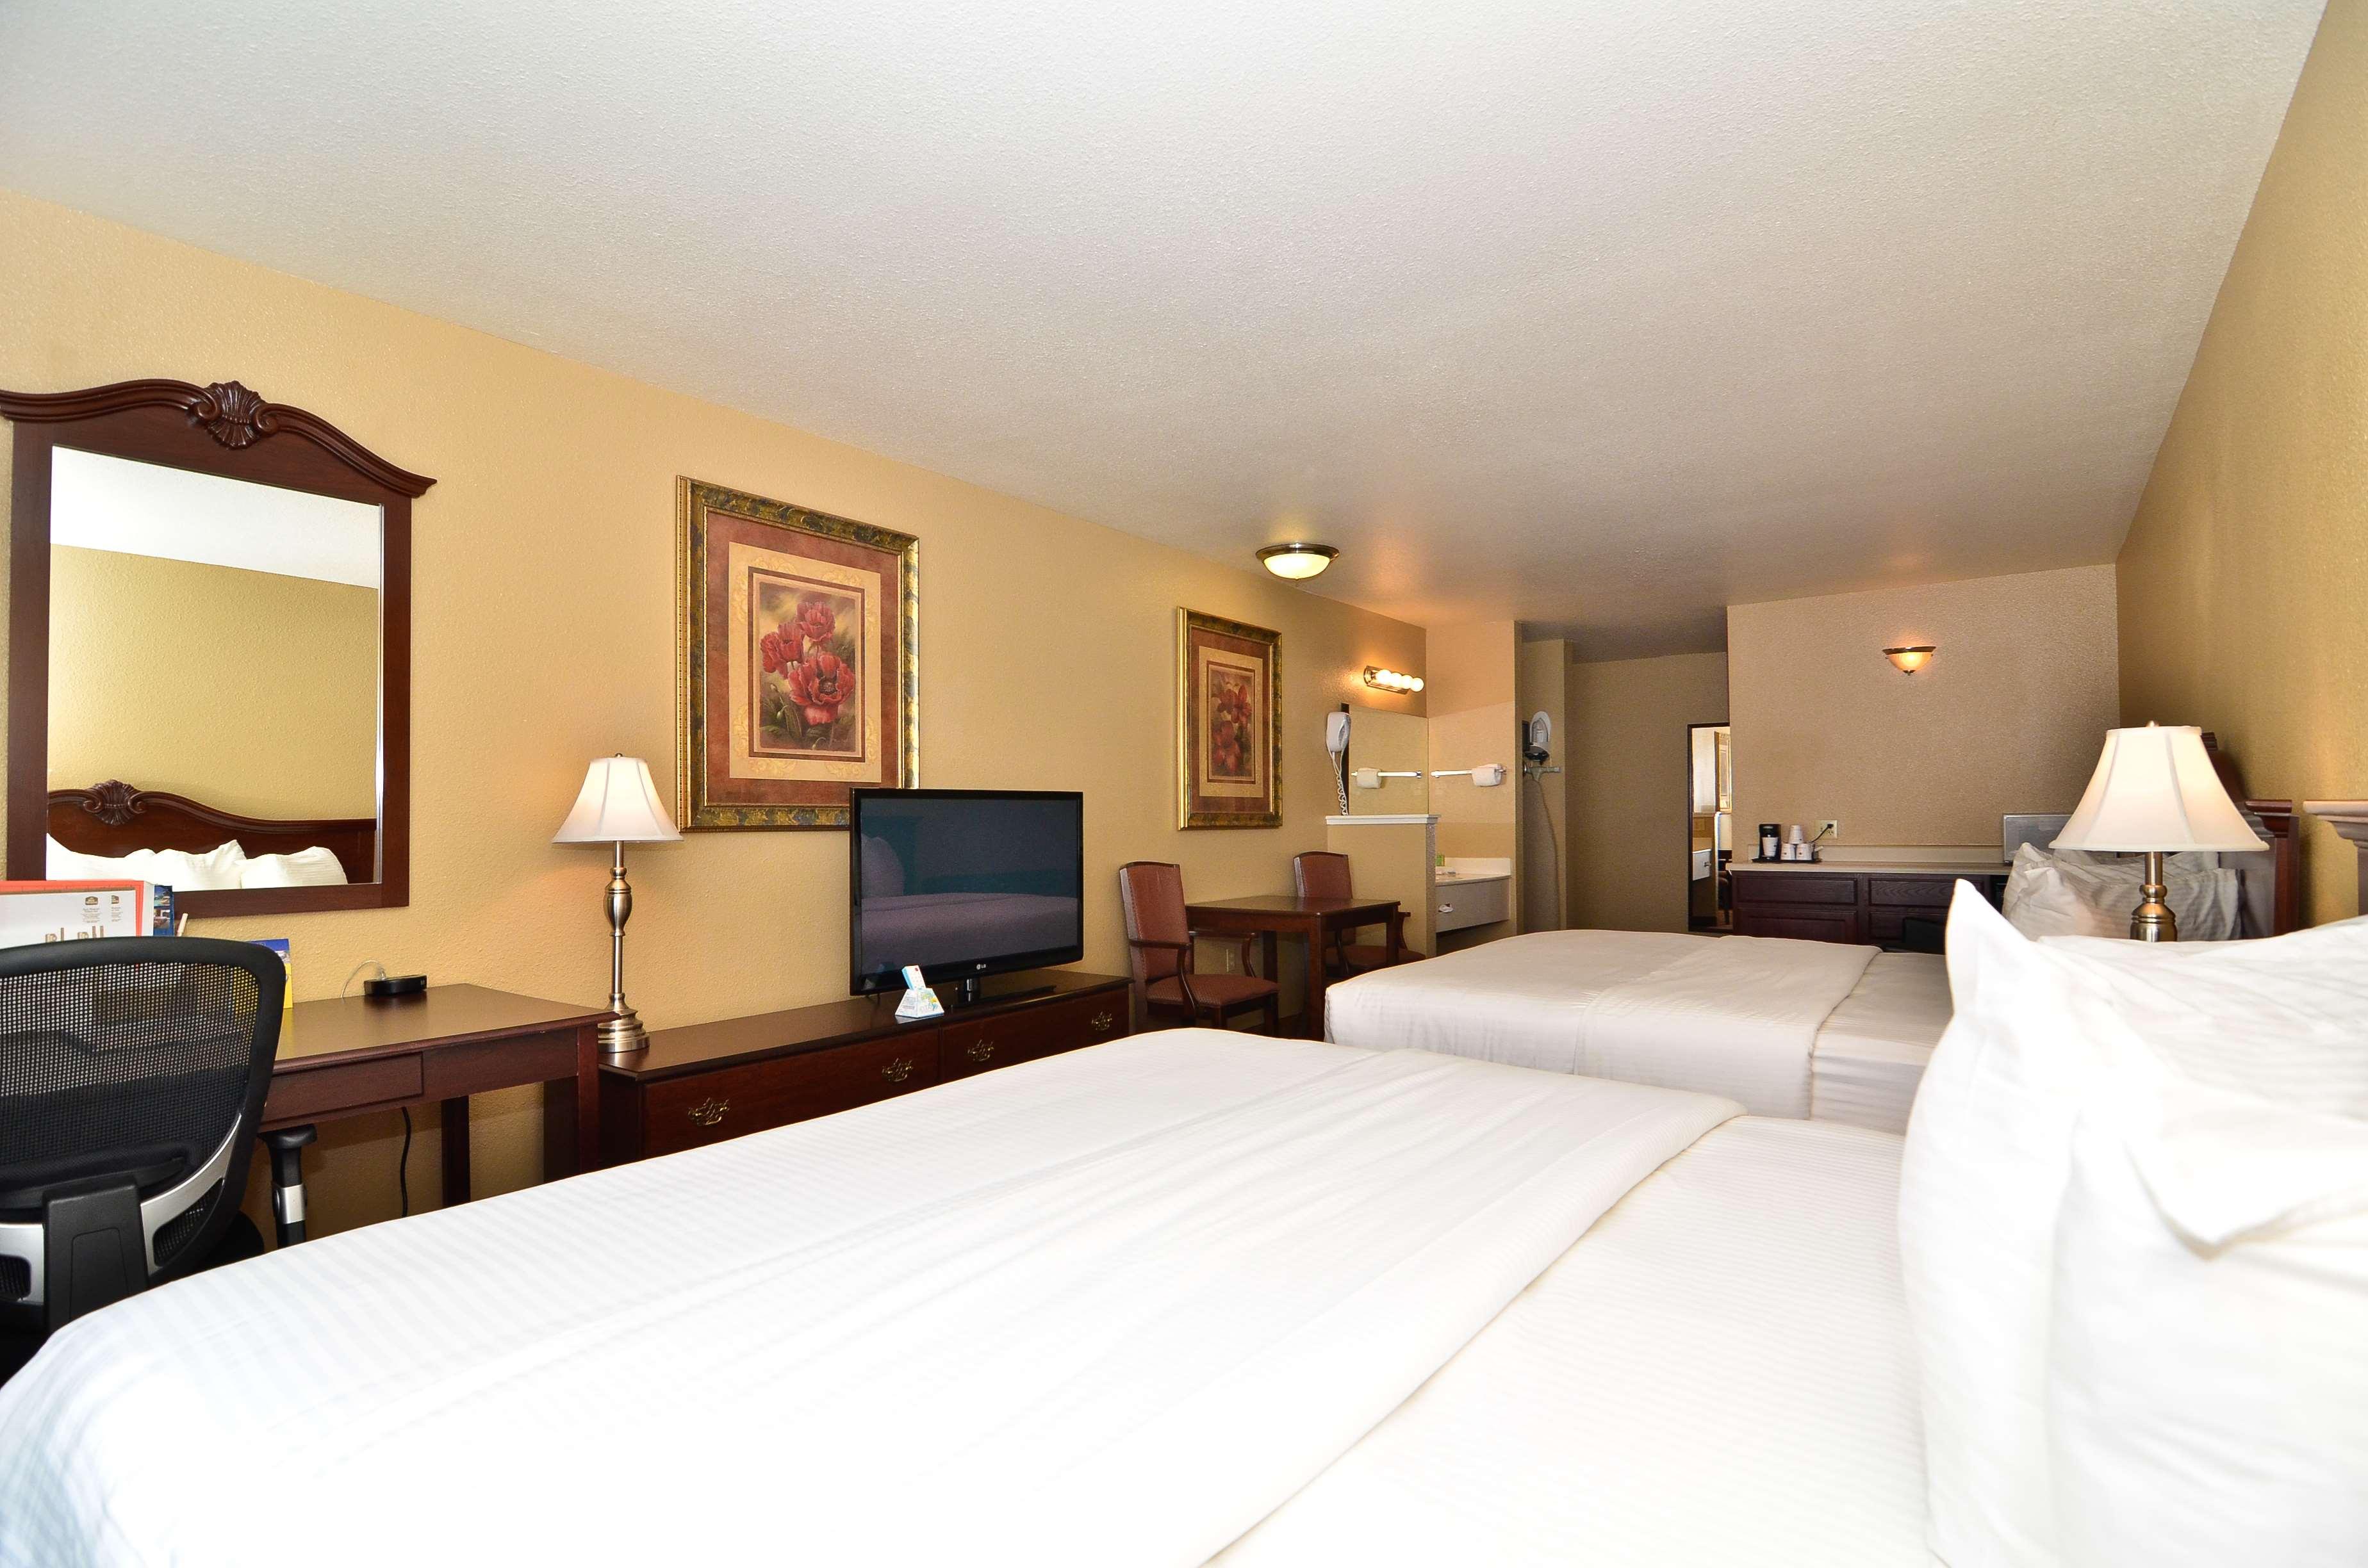 Best Western Fallon Inn & Suites image 18